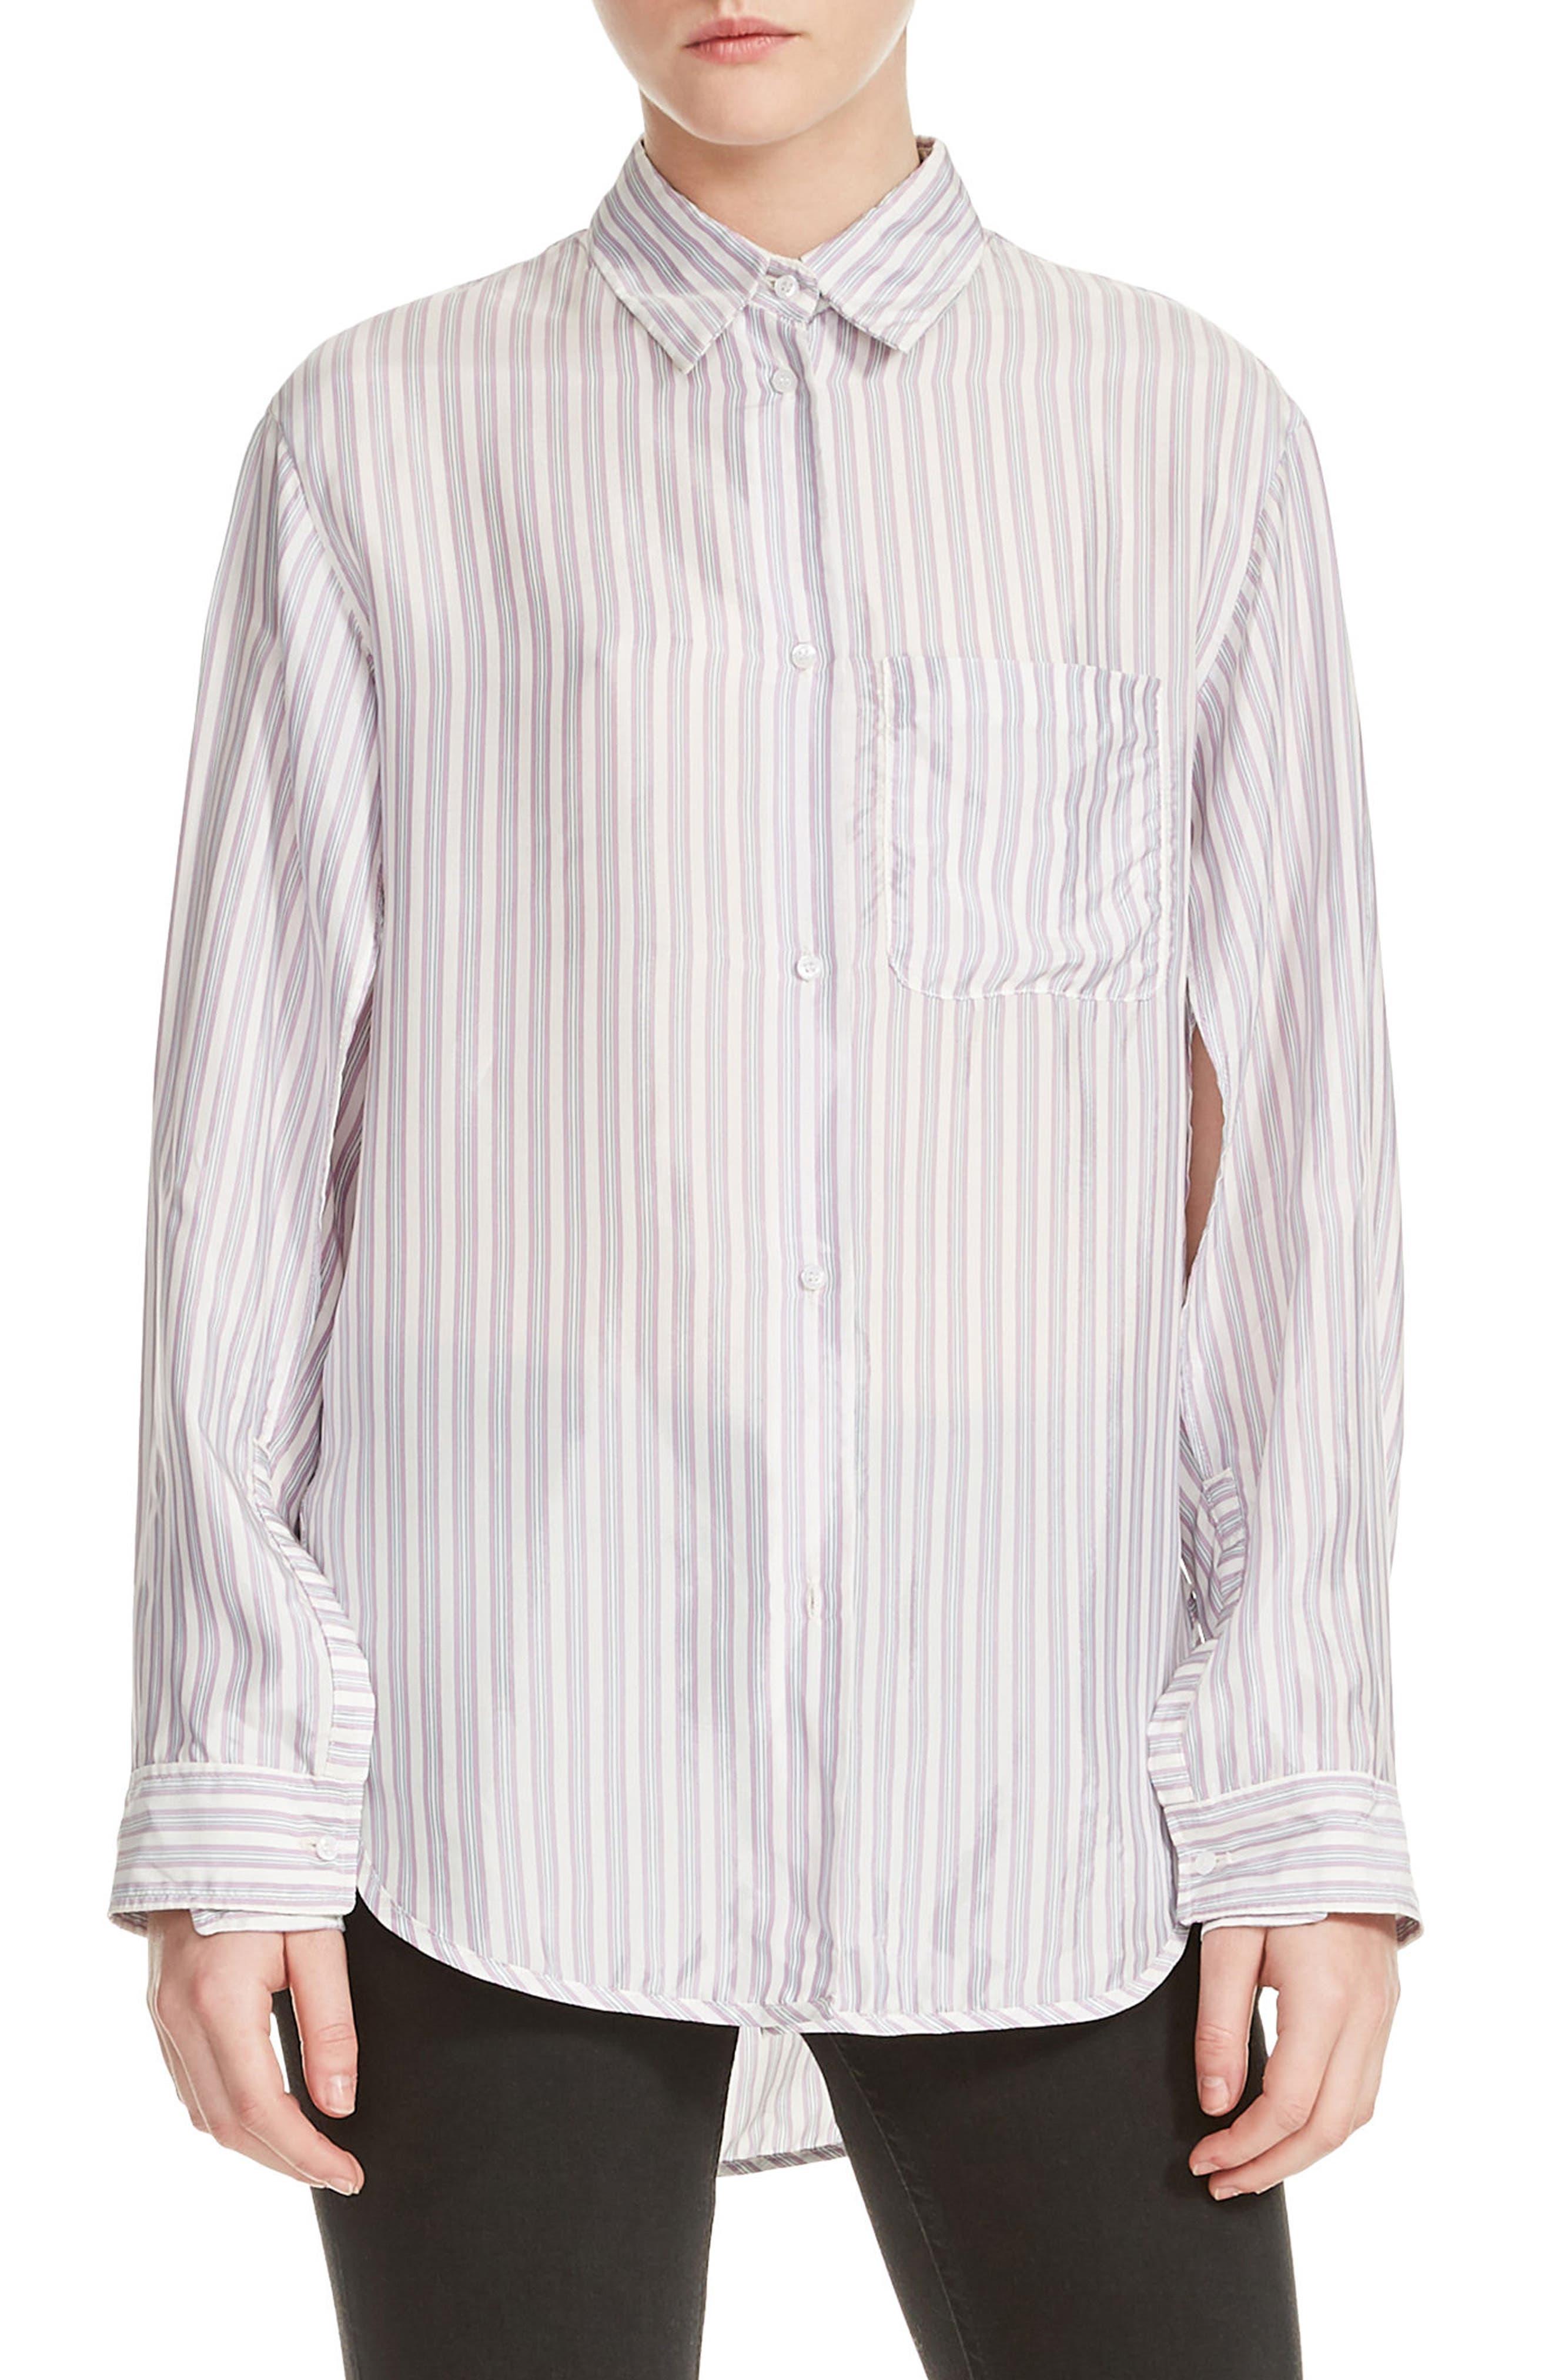 Celina High/Low Stripe Blouse,                         Main,                         color, 100